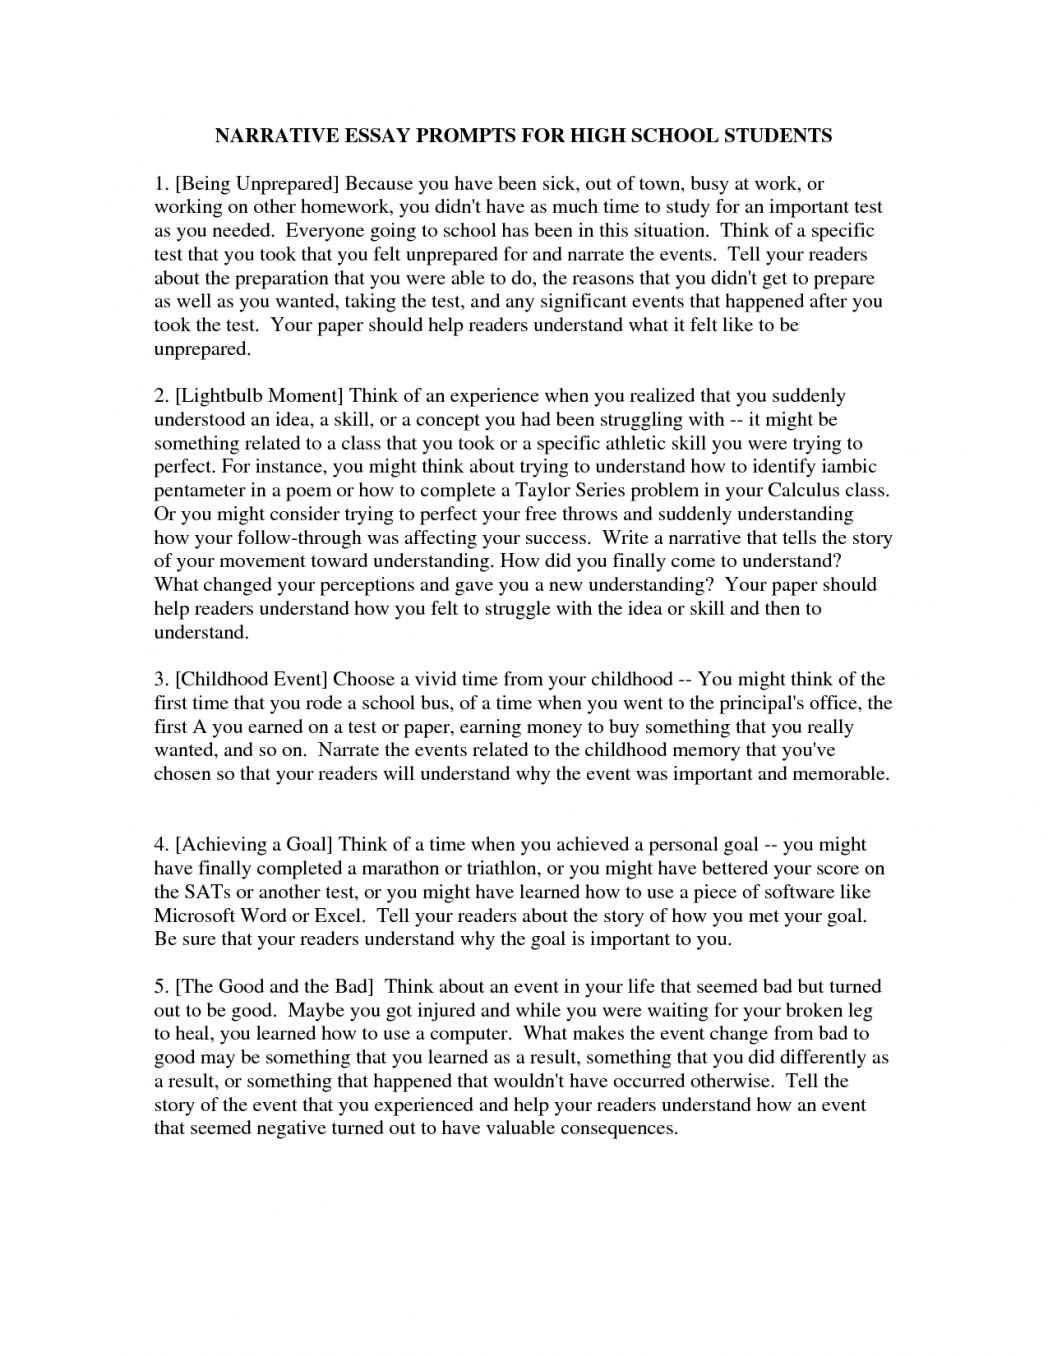 012 Informative Essay Examples For High School Example Narrative Goal Blockety Co Short Topics Students Essays Per Pdf Personal Marvelous Full